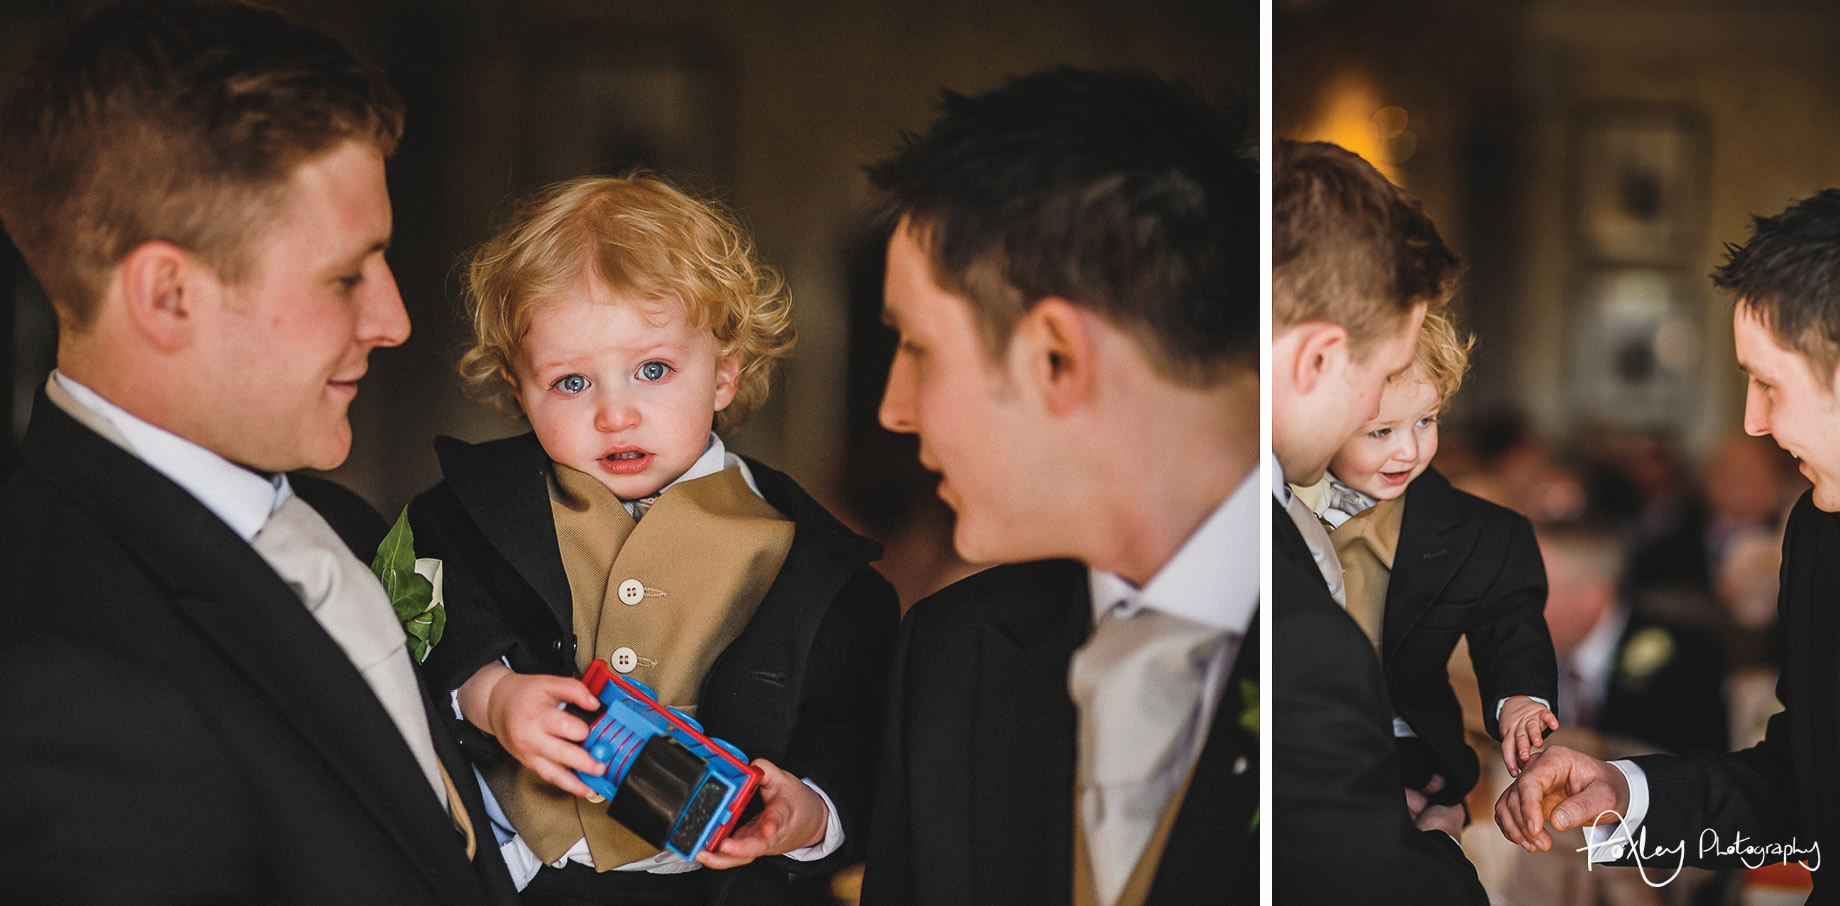 Gemma and Lewis' Wedding at Mitton Hall 067